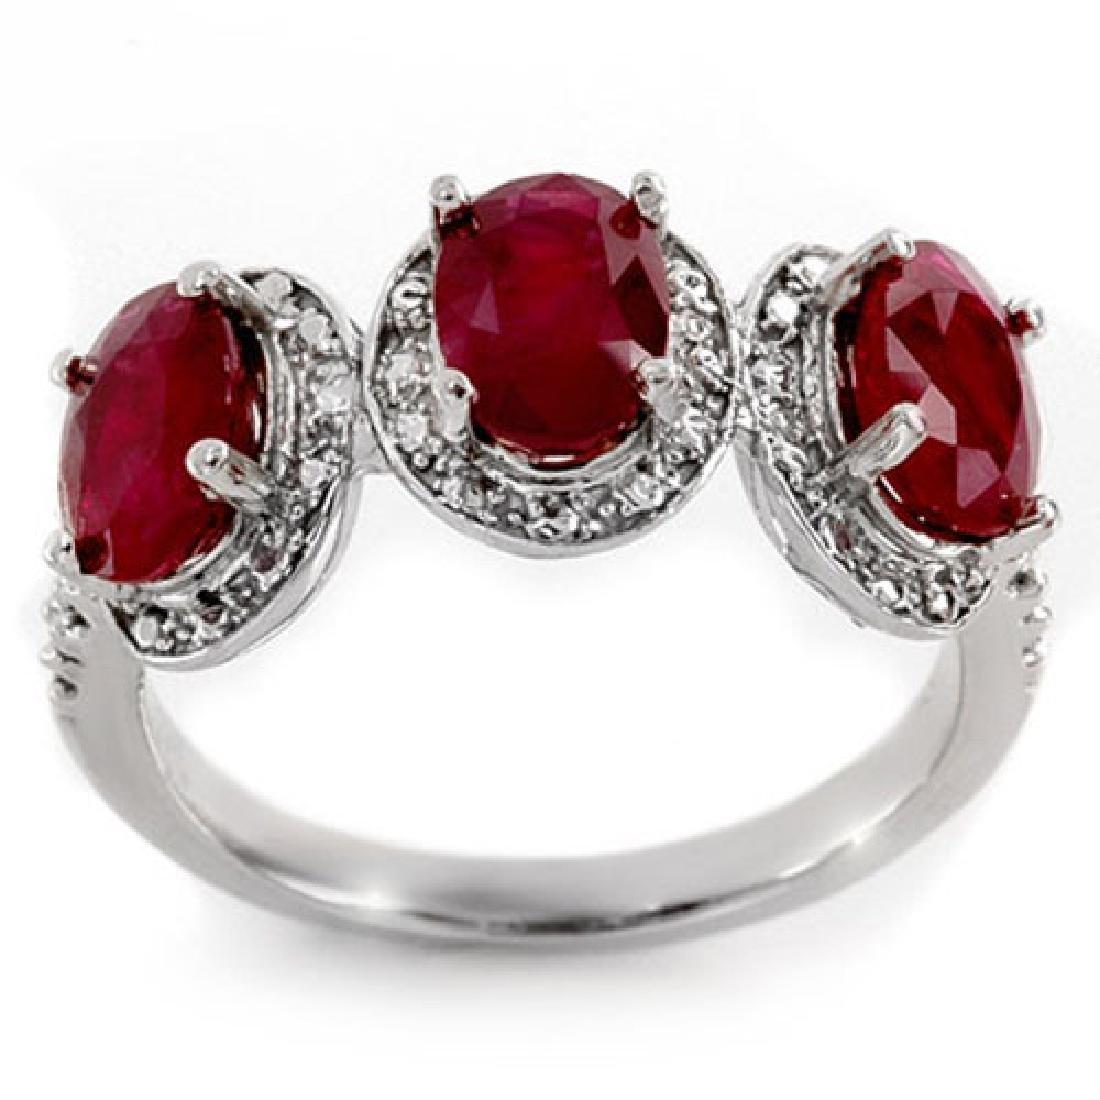 3.08 CTW Ruby & Diamond Ring 10K White Gold